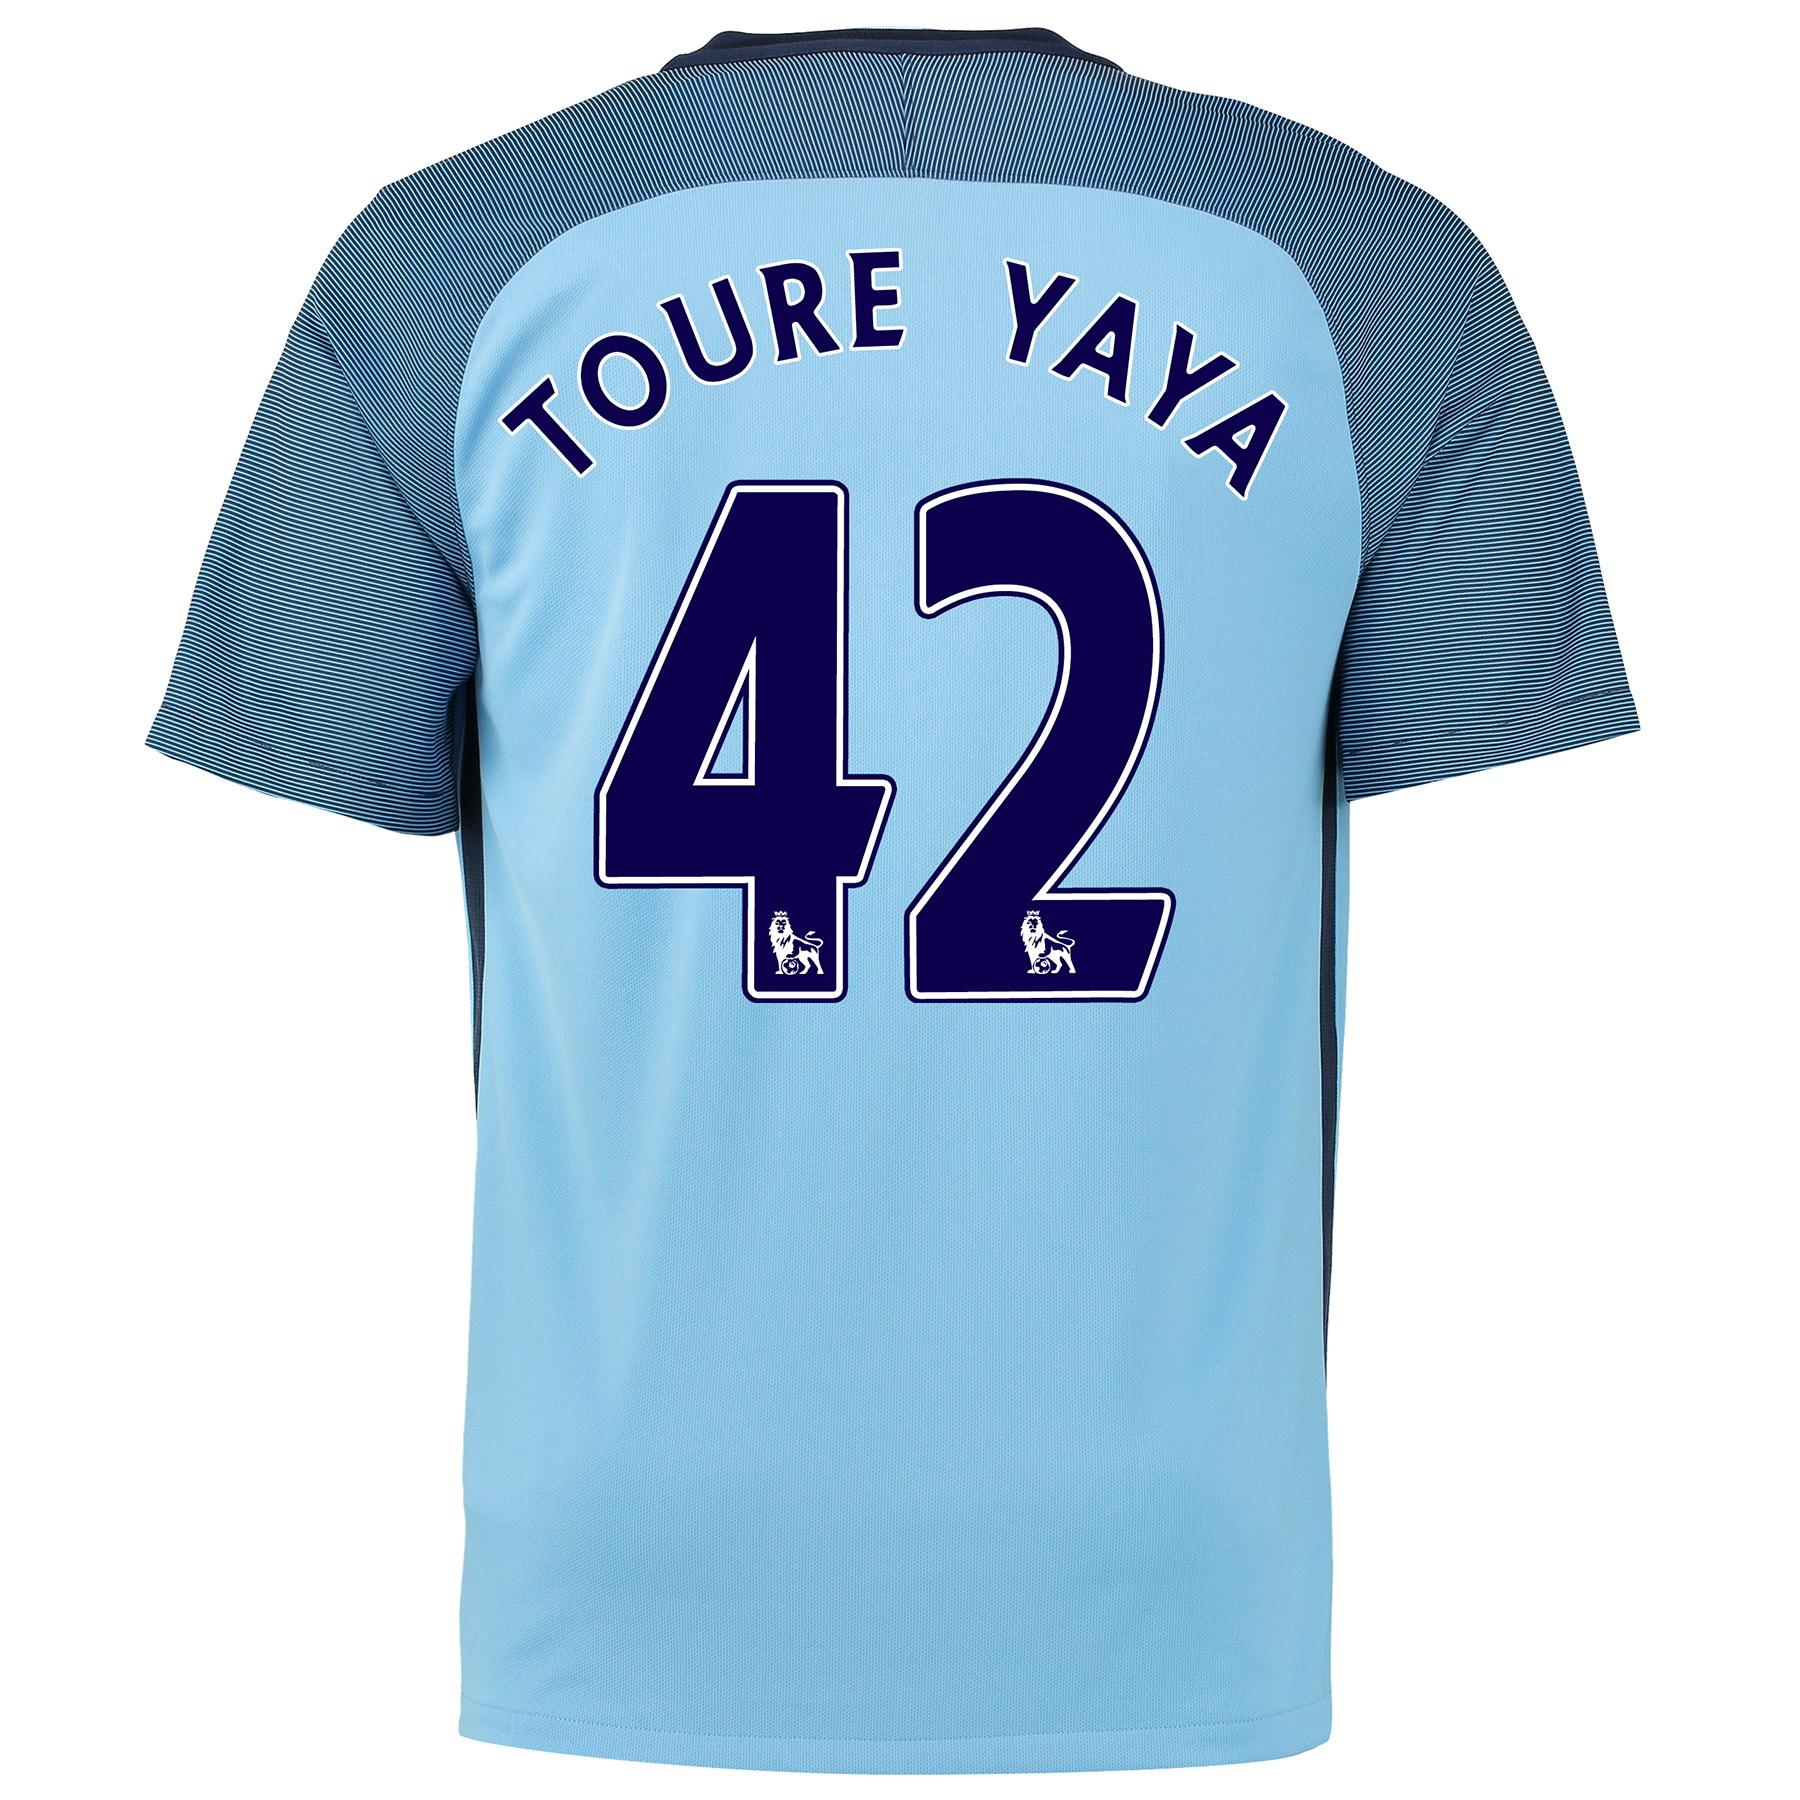 Manchester City Home Shirt 2016-17 - Kids with Toure Yaya 42 printing